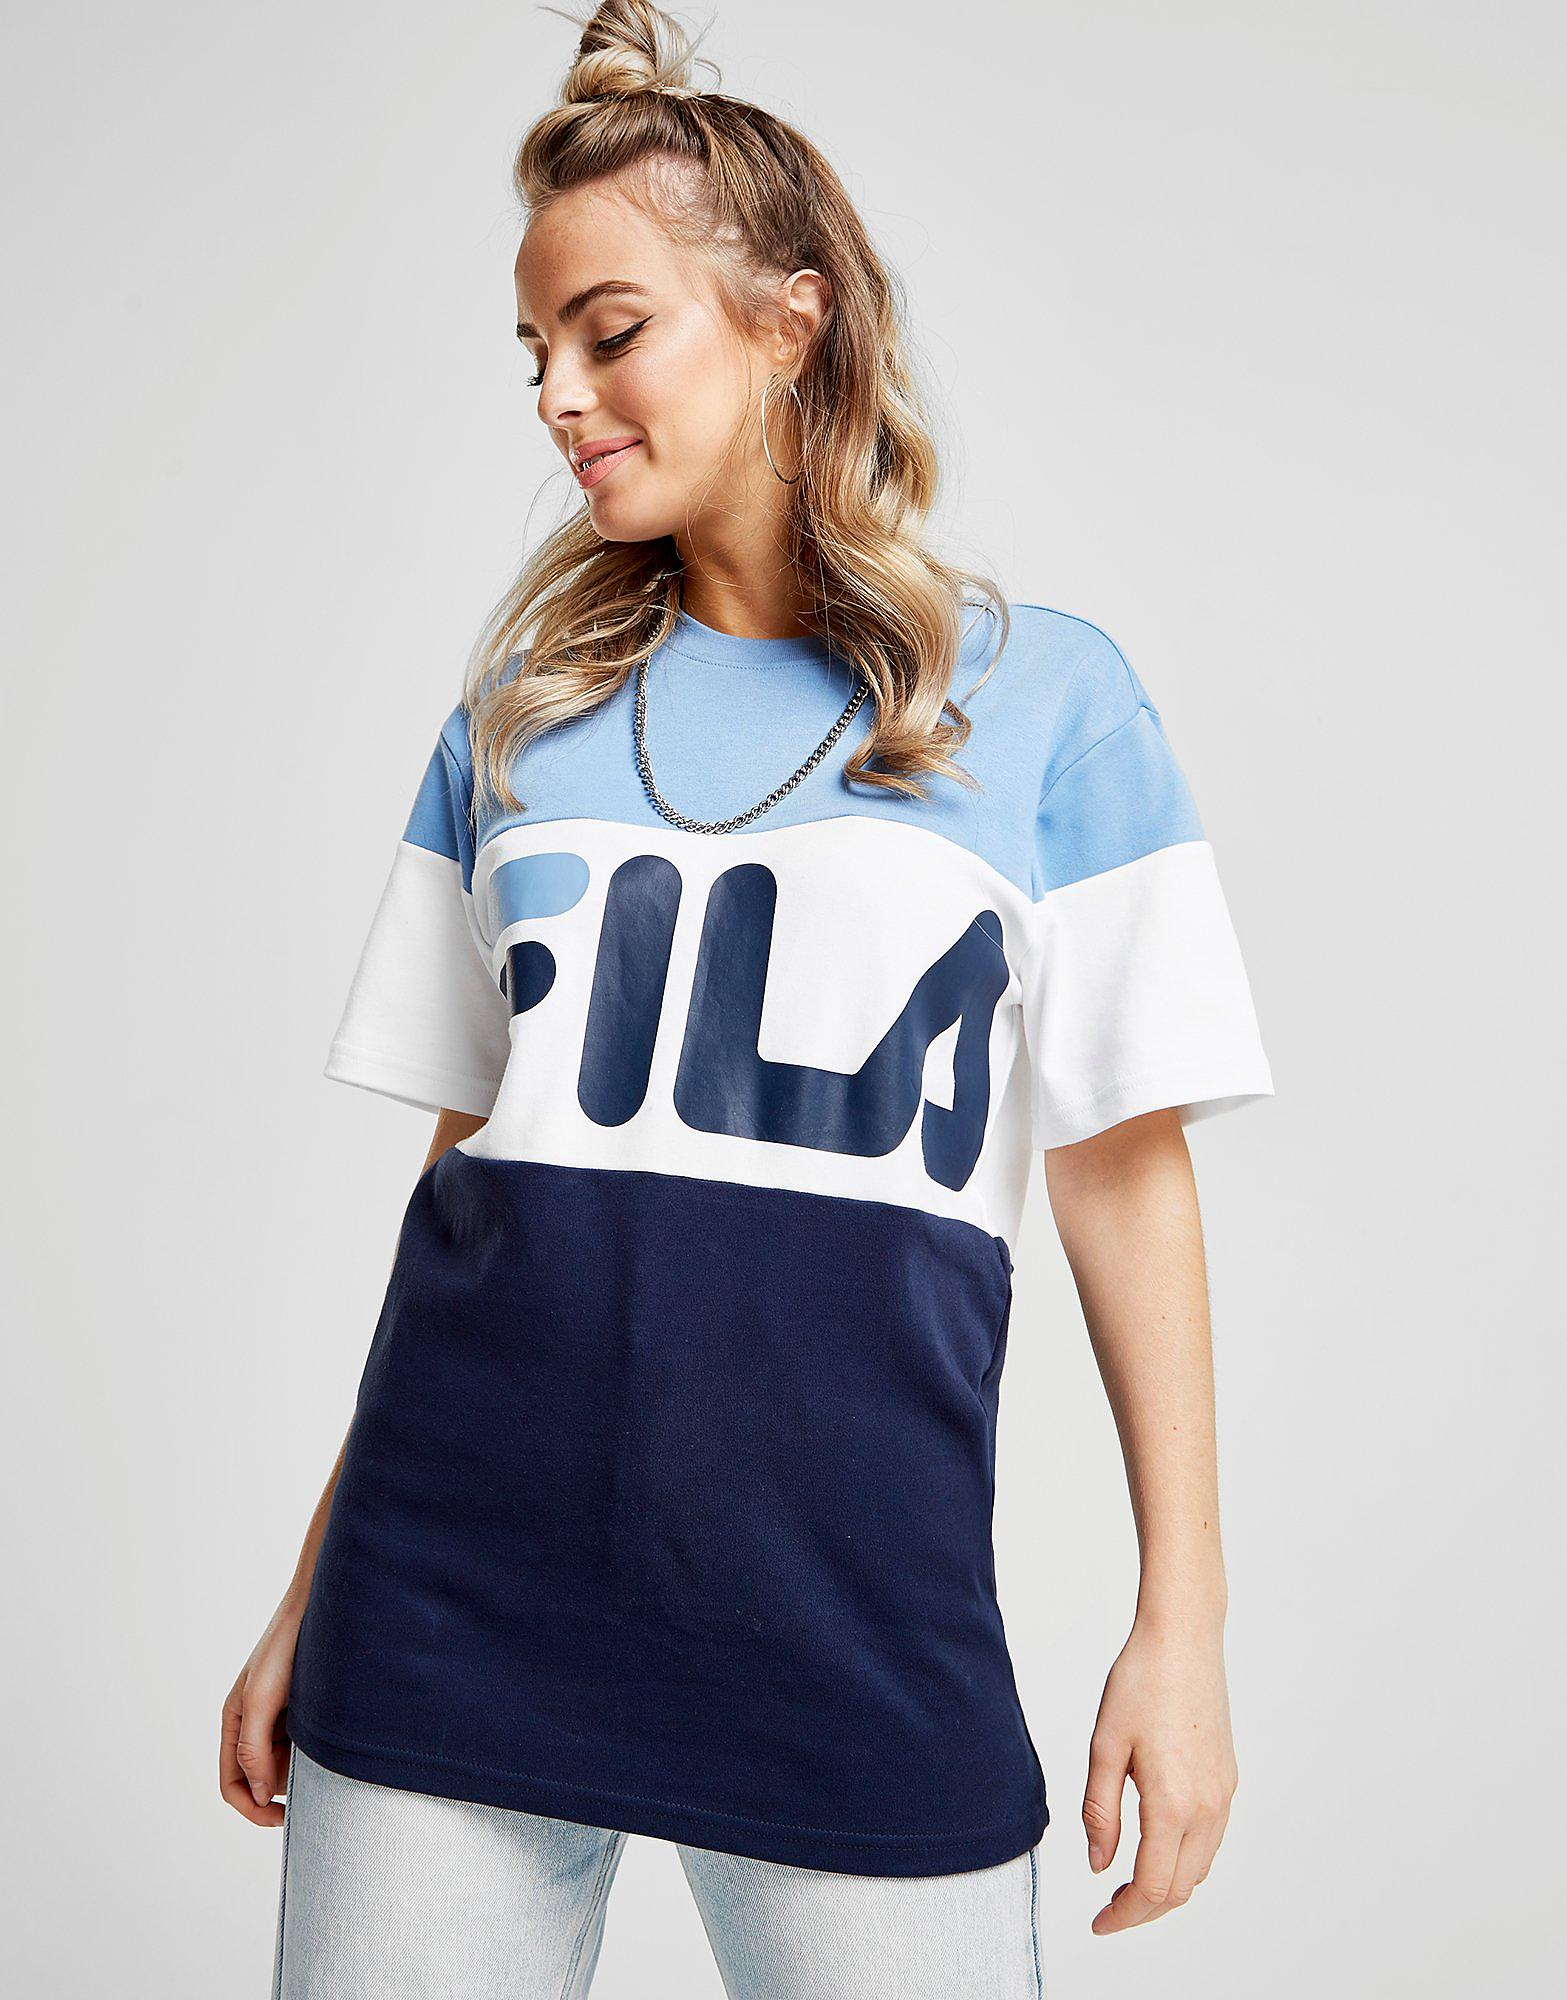 Fila ColourblockT-Shirt